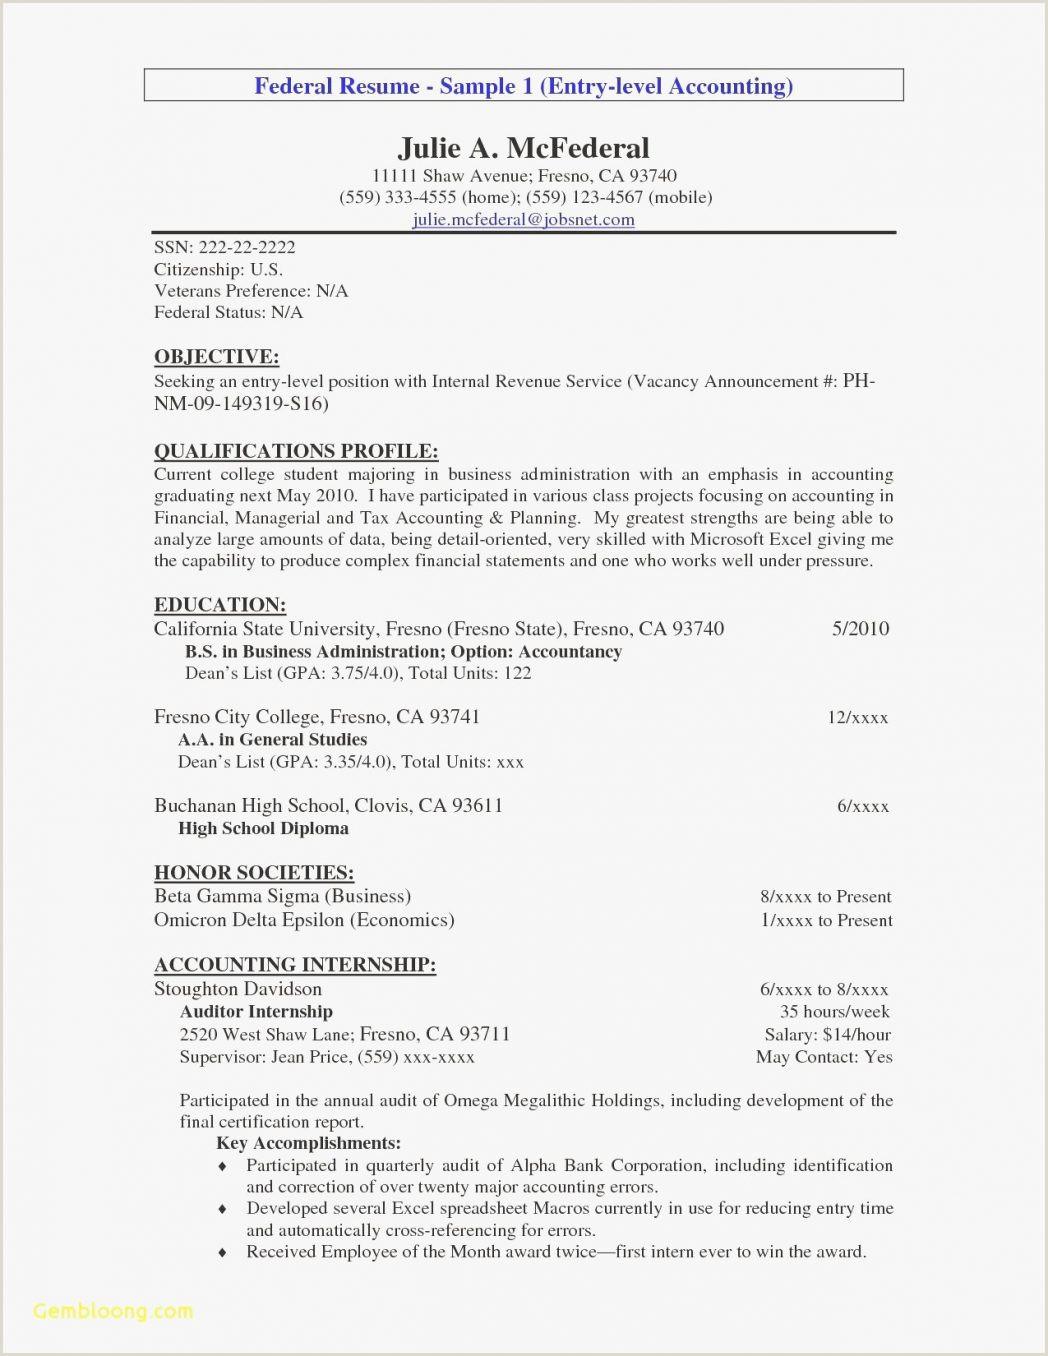 Software Developer Cover Letter Sample Cover Letter De Shaw Exclusive Entry Level Examples Elegant